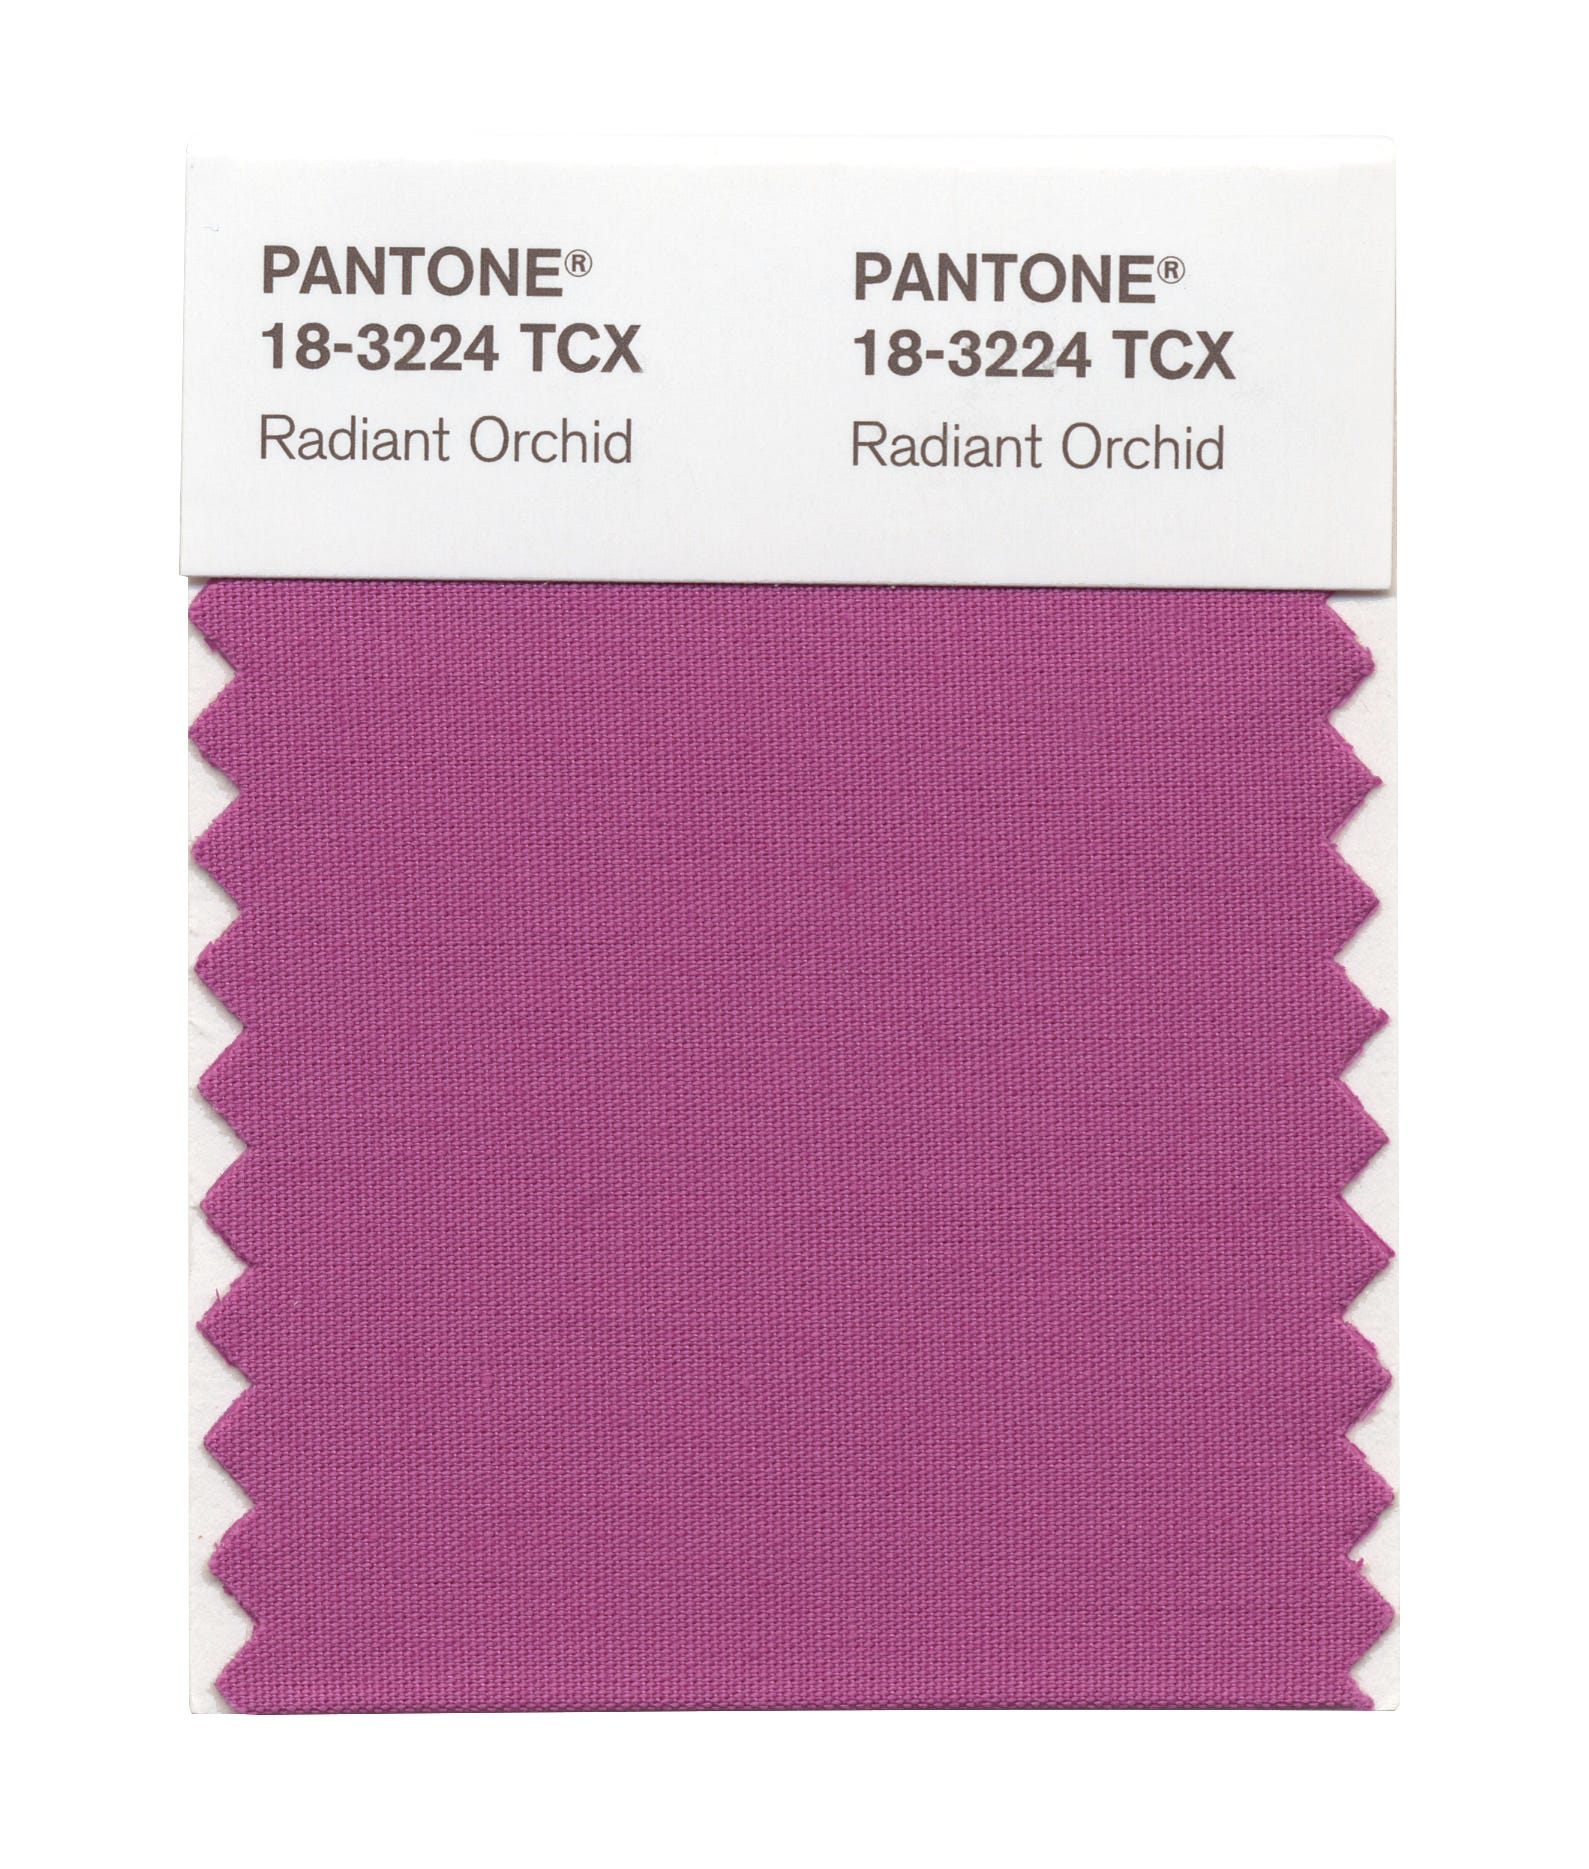 116f427a 635848419114551339-2014-PANTONE-18-3224-Radiant-Orchid-mini-Swatch-Card.jpg